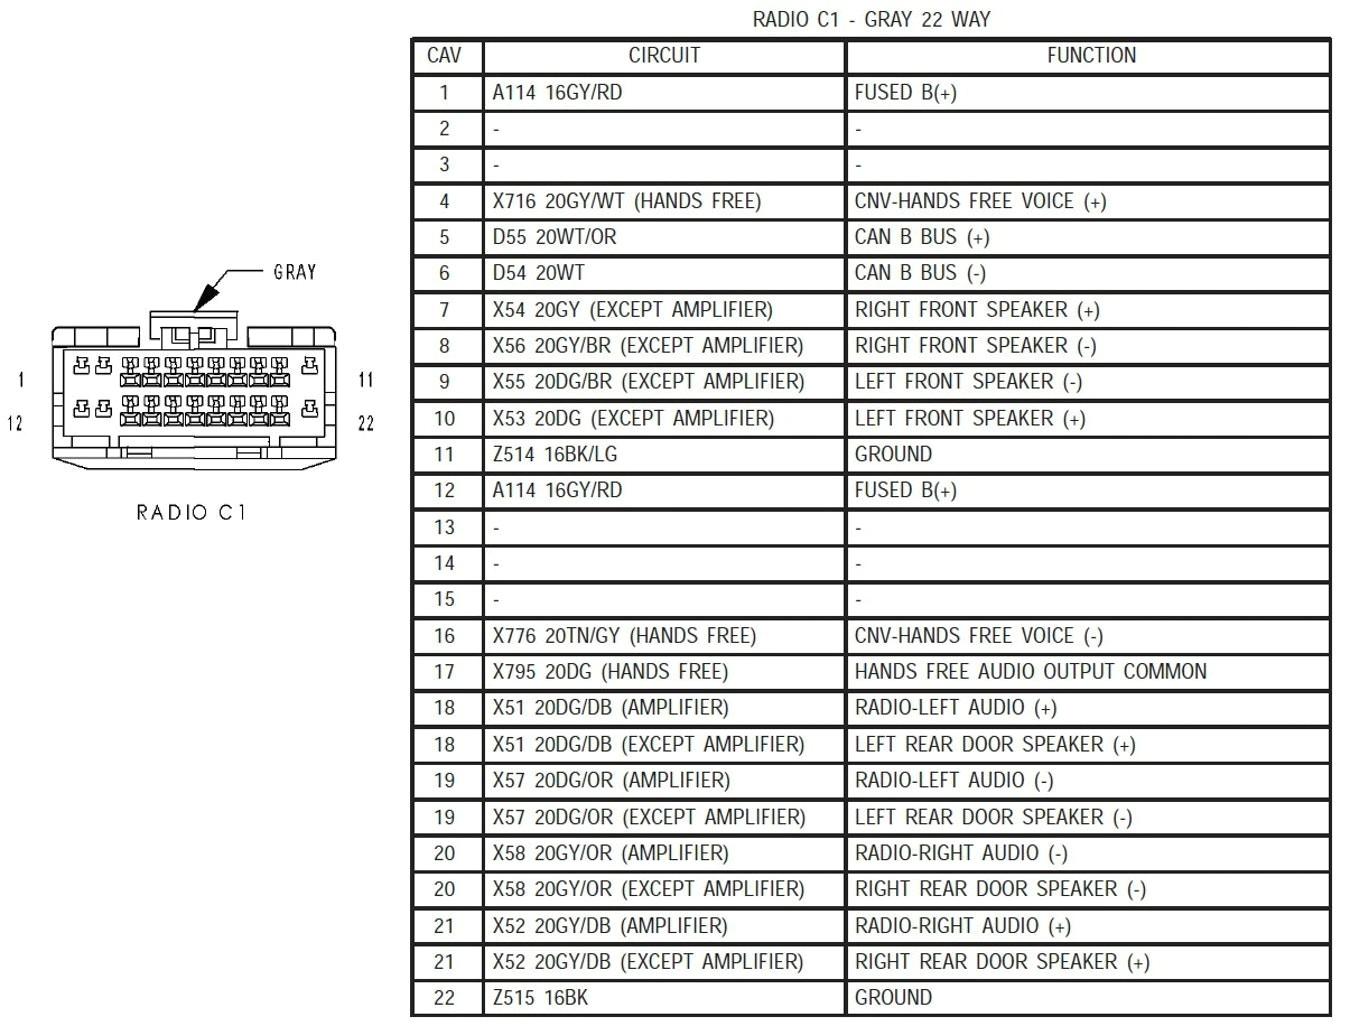 kenwood ddx 319 wiring diagram wiring diagram datasource kenwood ddx319 wiring diagram kenwood ddx 319 wiring diagram